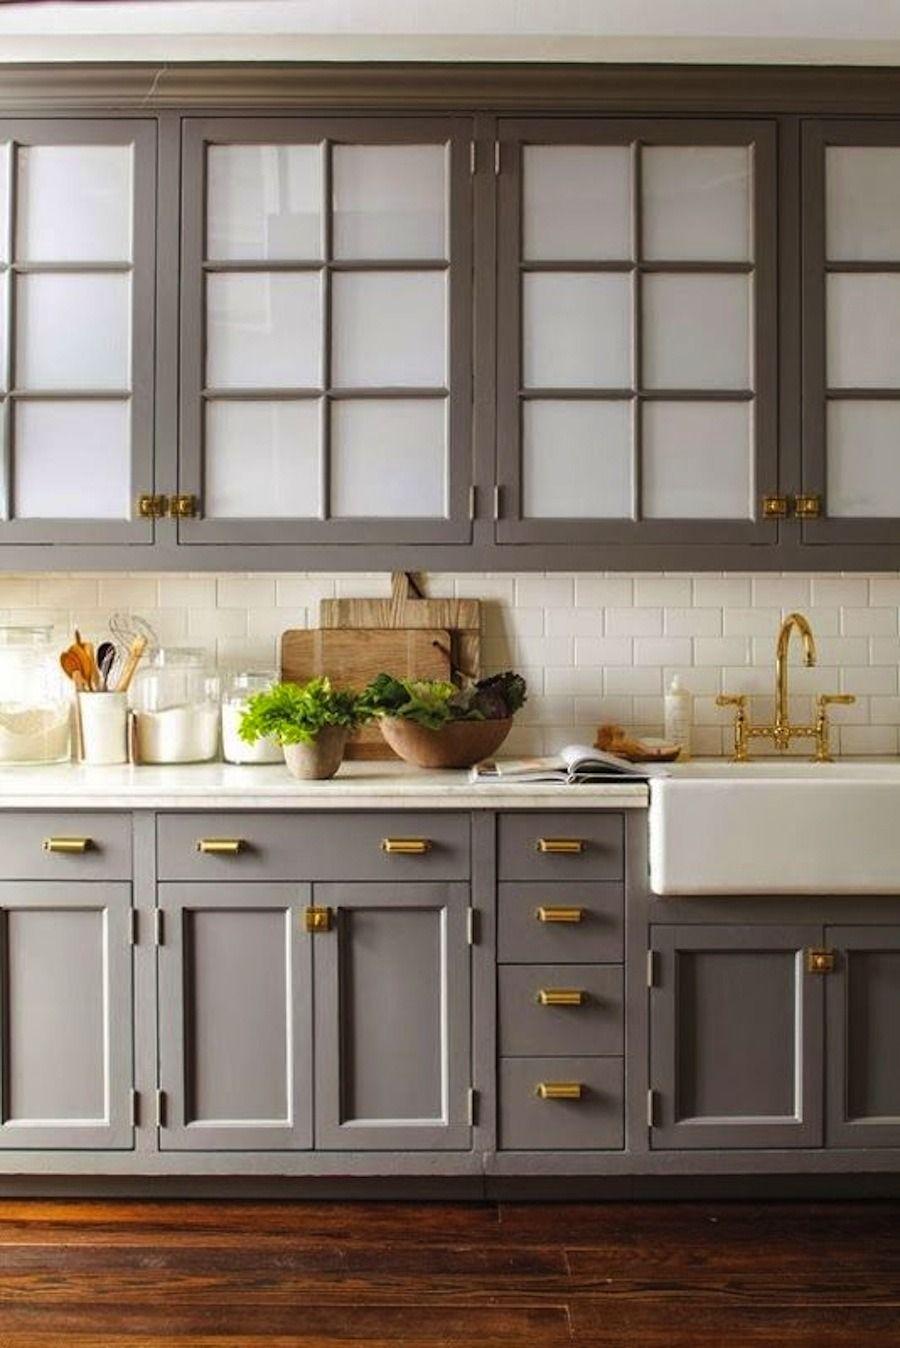 Stunning Gray Kitchens Gray Kitchens Kitchen Hardware And Sinks - Warm grey kitchen cabinets